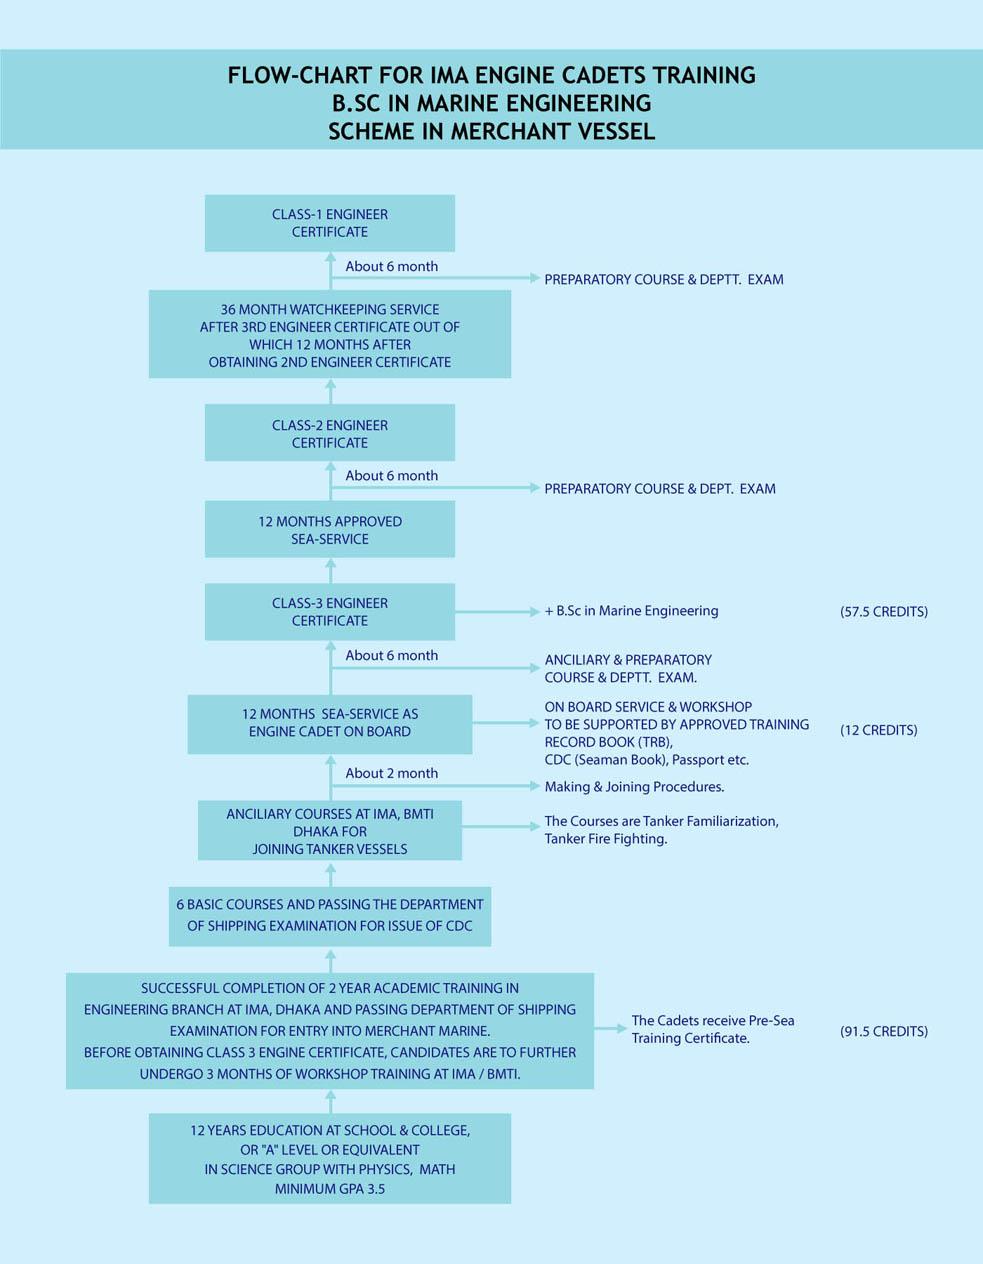 Career international maritime academy flow chart of career path for ima engineering cadets nvjuhfo Gallery